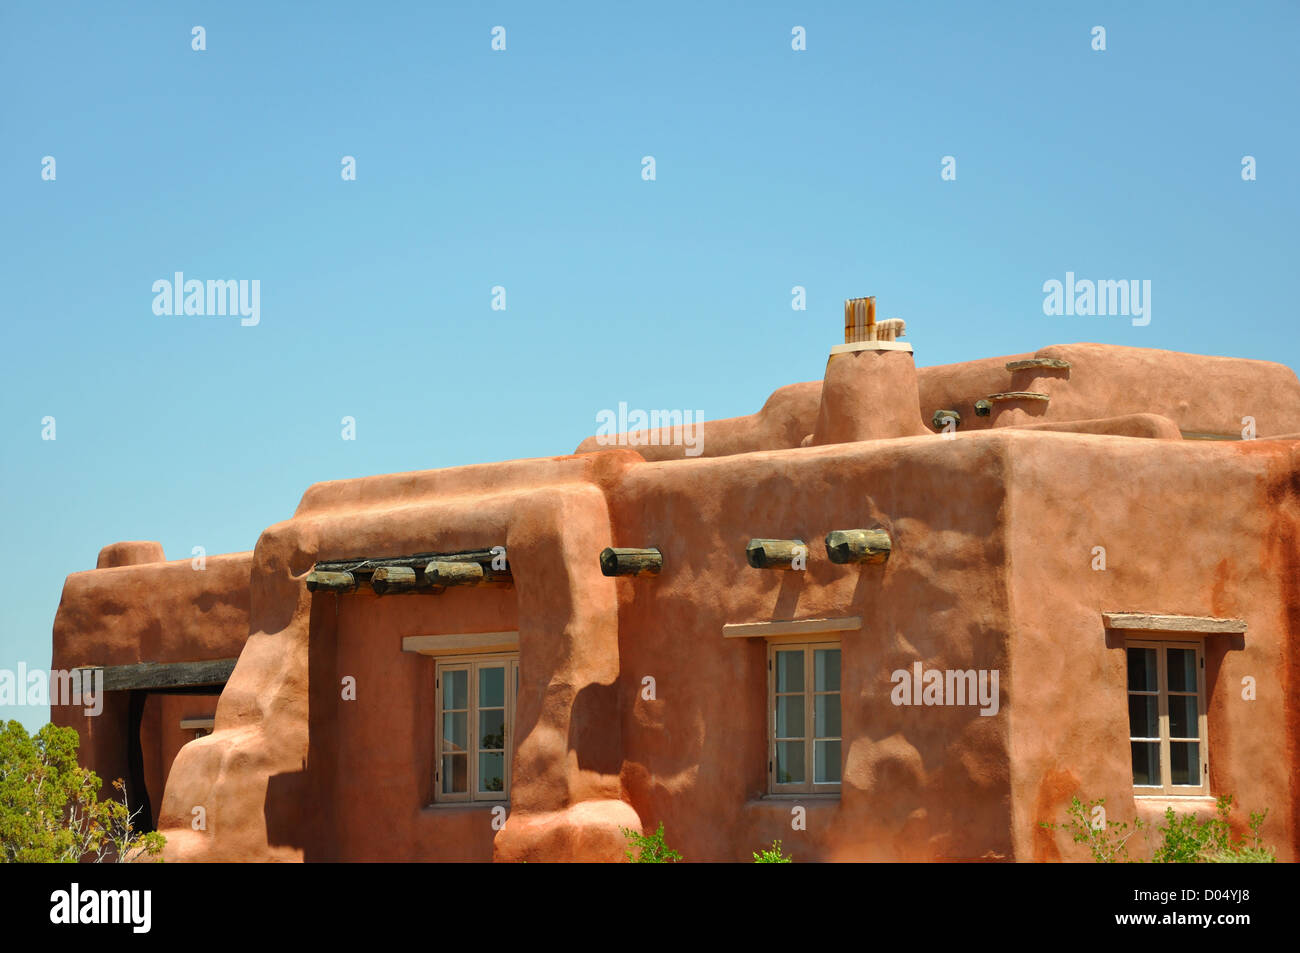 Adobe-Stil Haus, Arizona, USA Stockbild